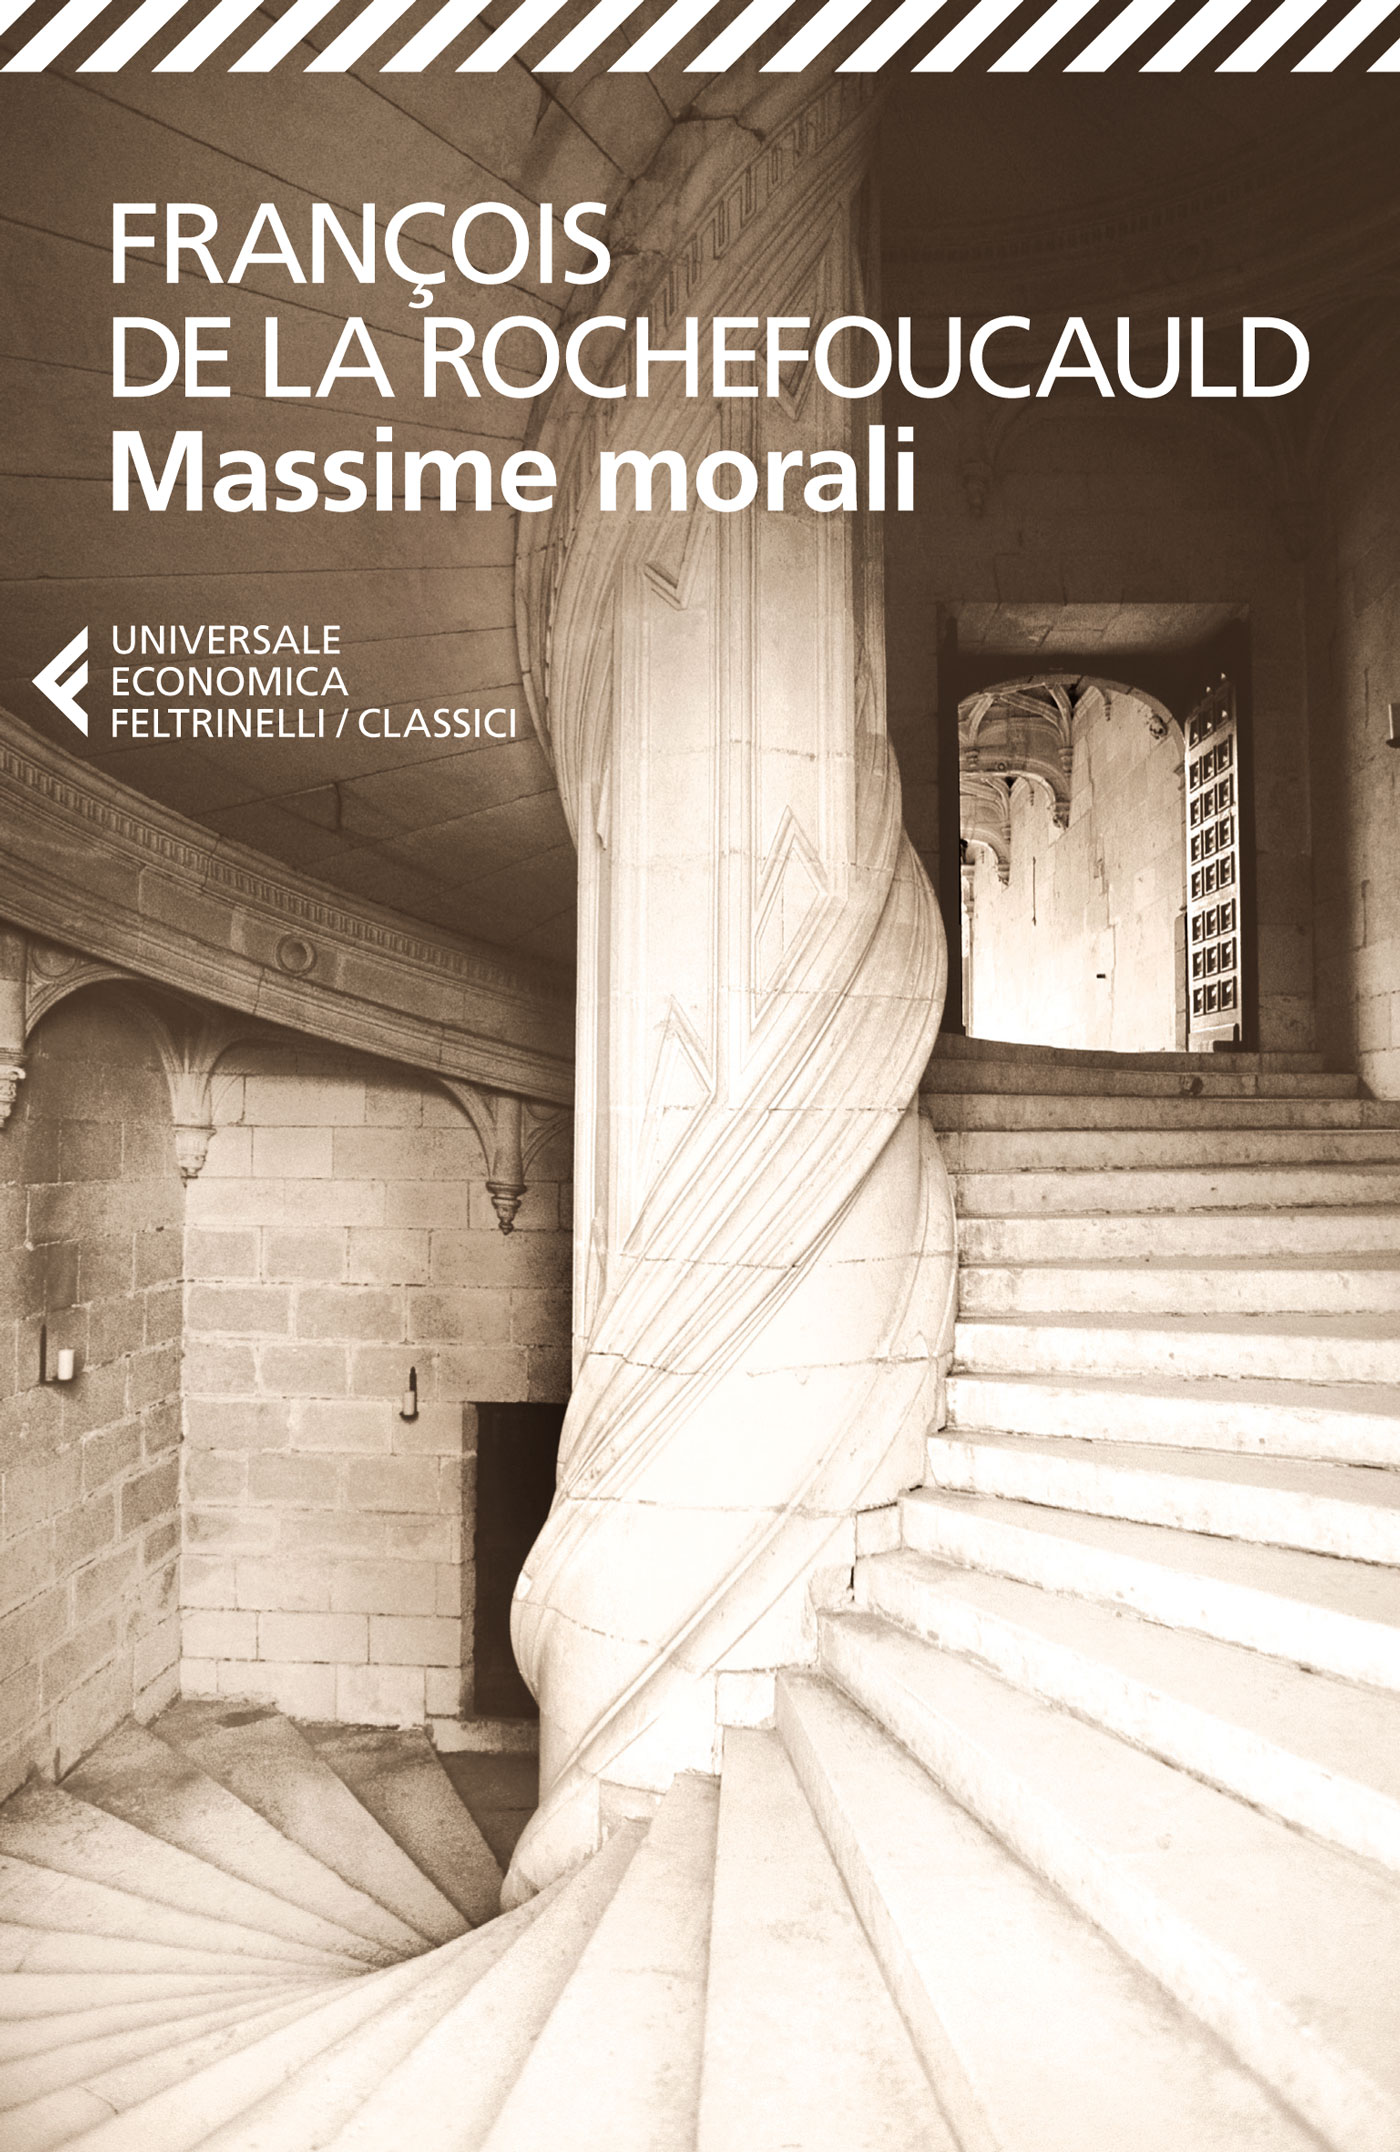 Massime morali